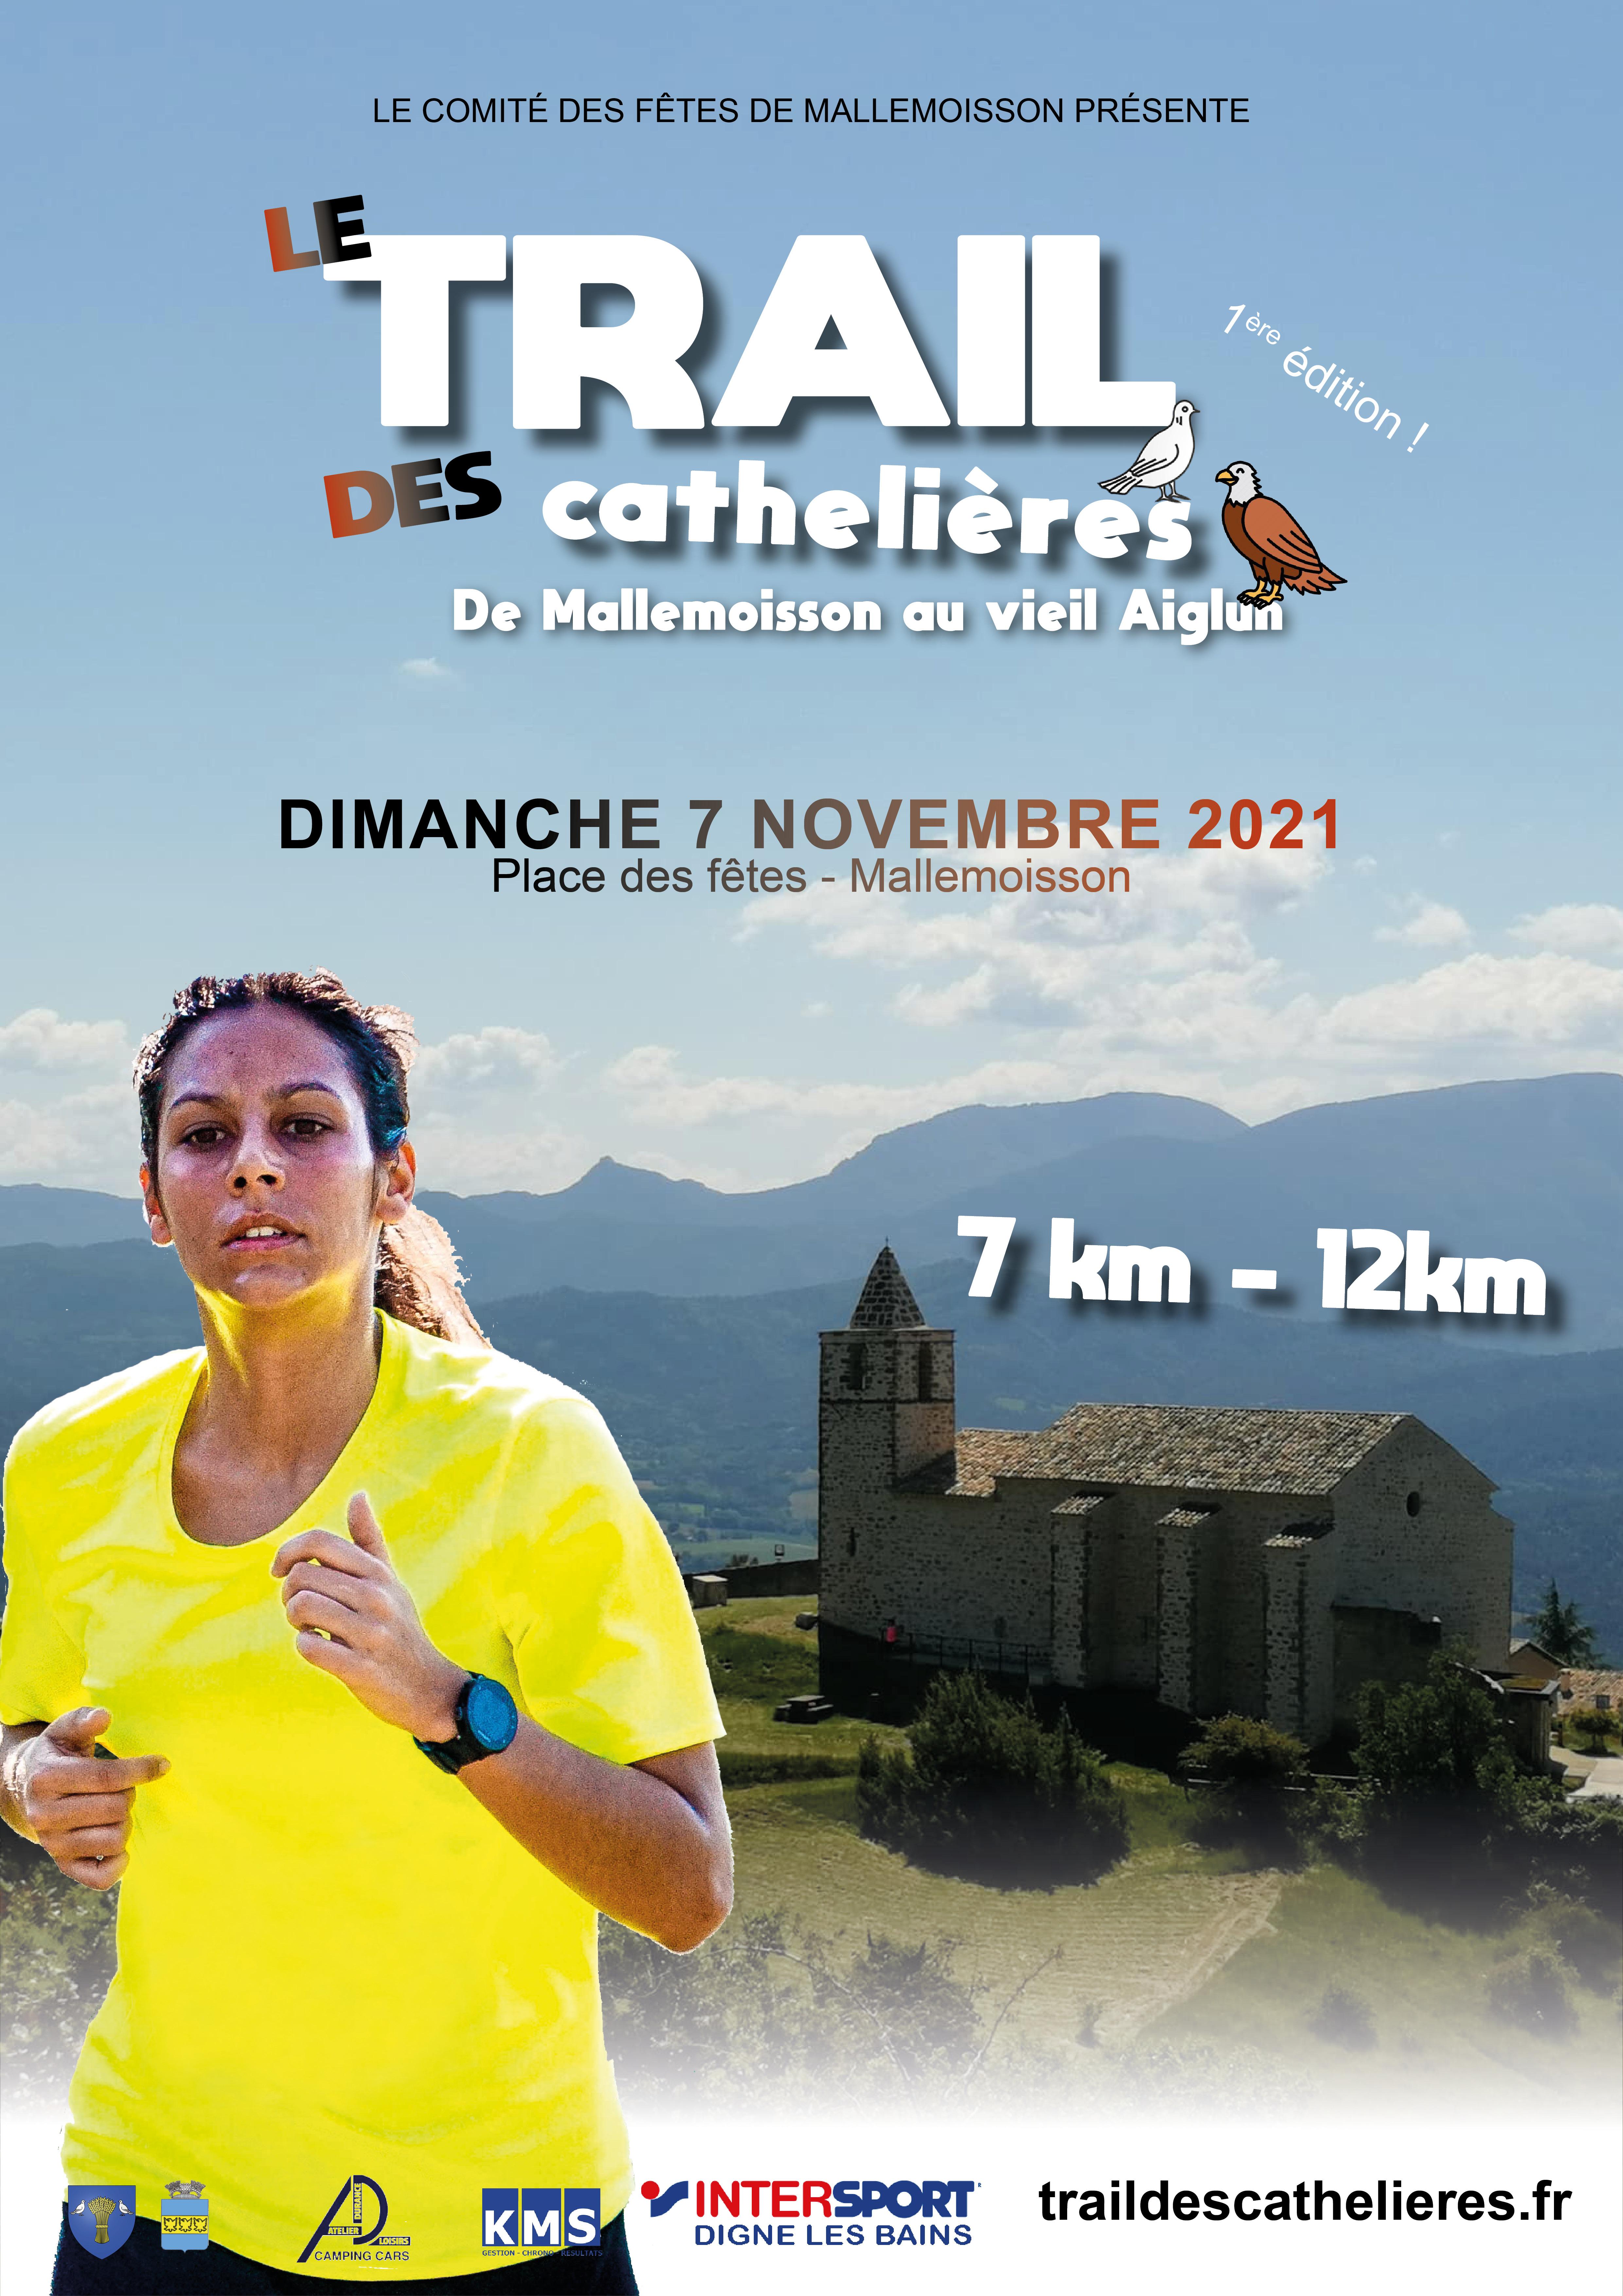 TRAIL DES CATHELIERES